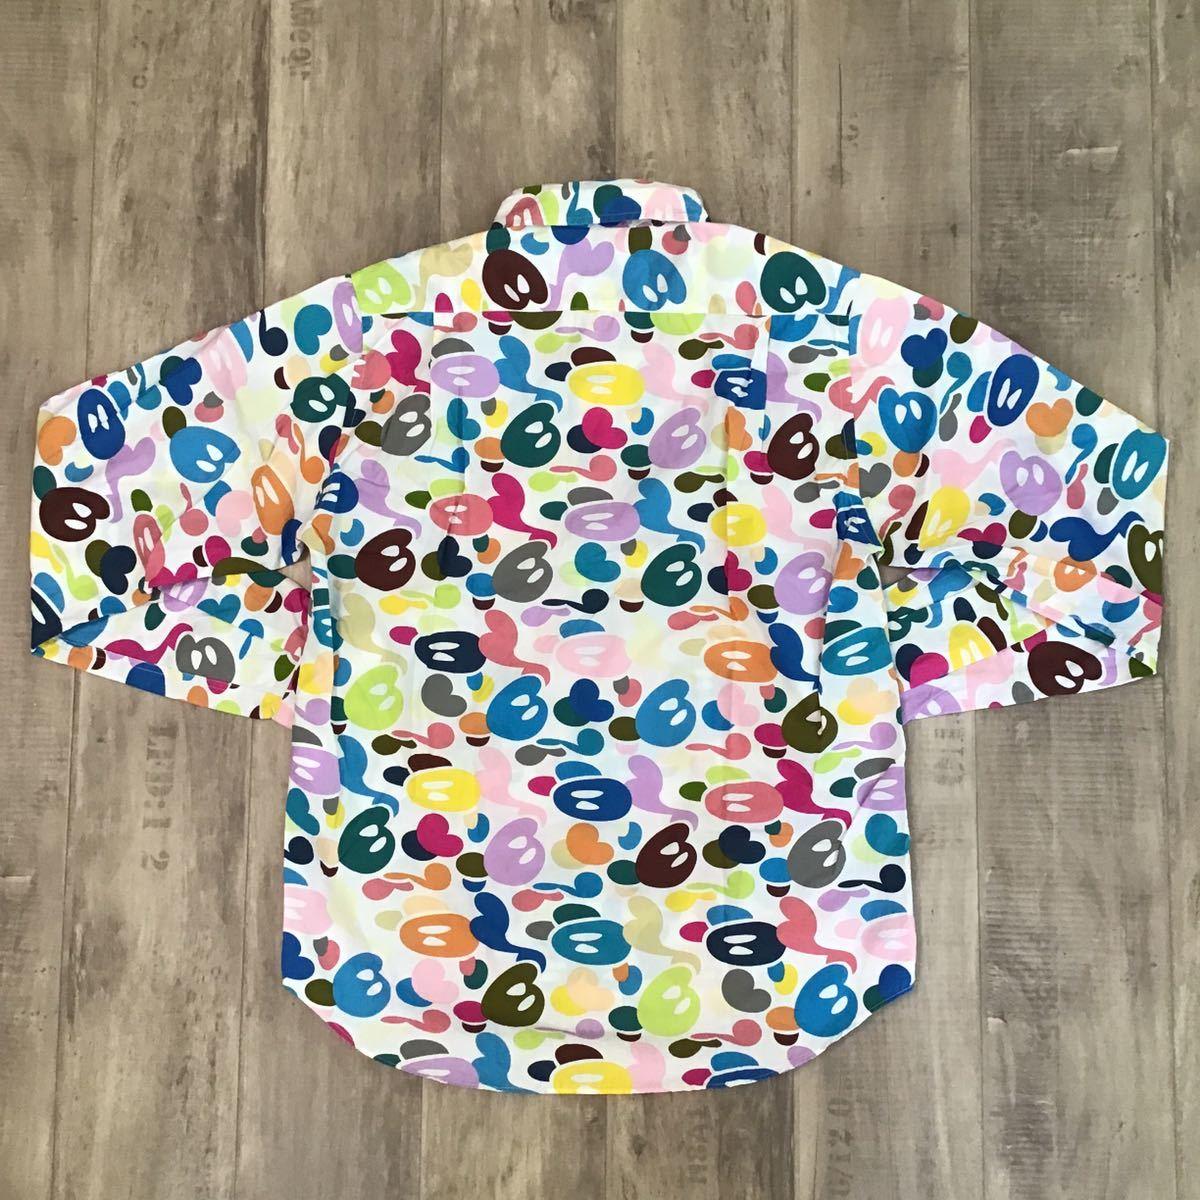 milo multi camo 長袖シャツ Mサイズ a bathing ape bape エイプ ベイプ アベイシングエイプ マルチカモ マイロ 迷彩 nigo tp31